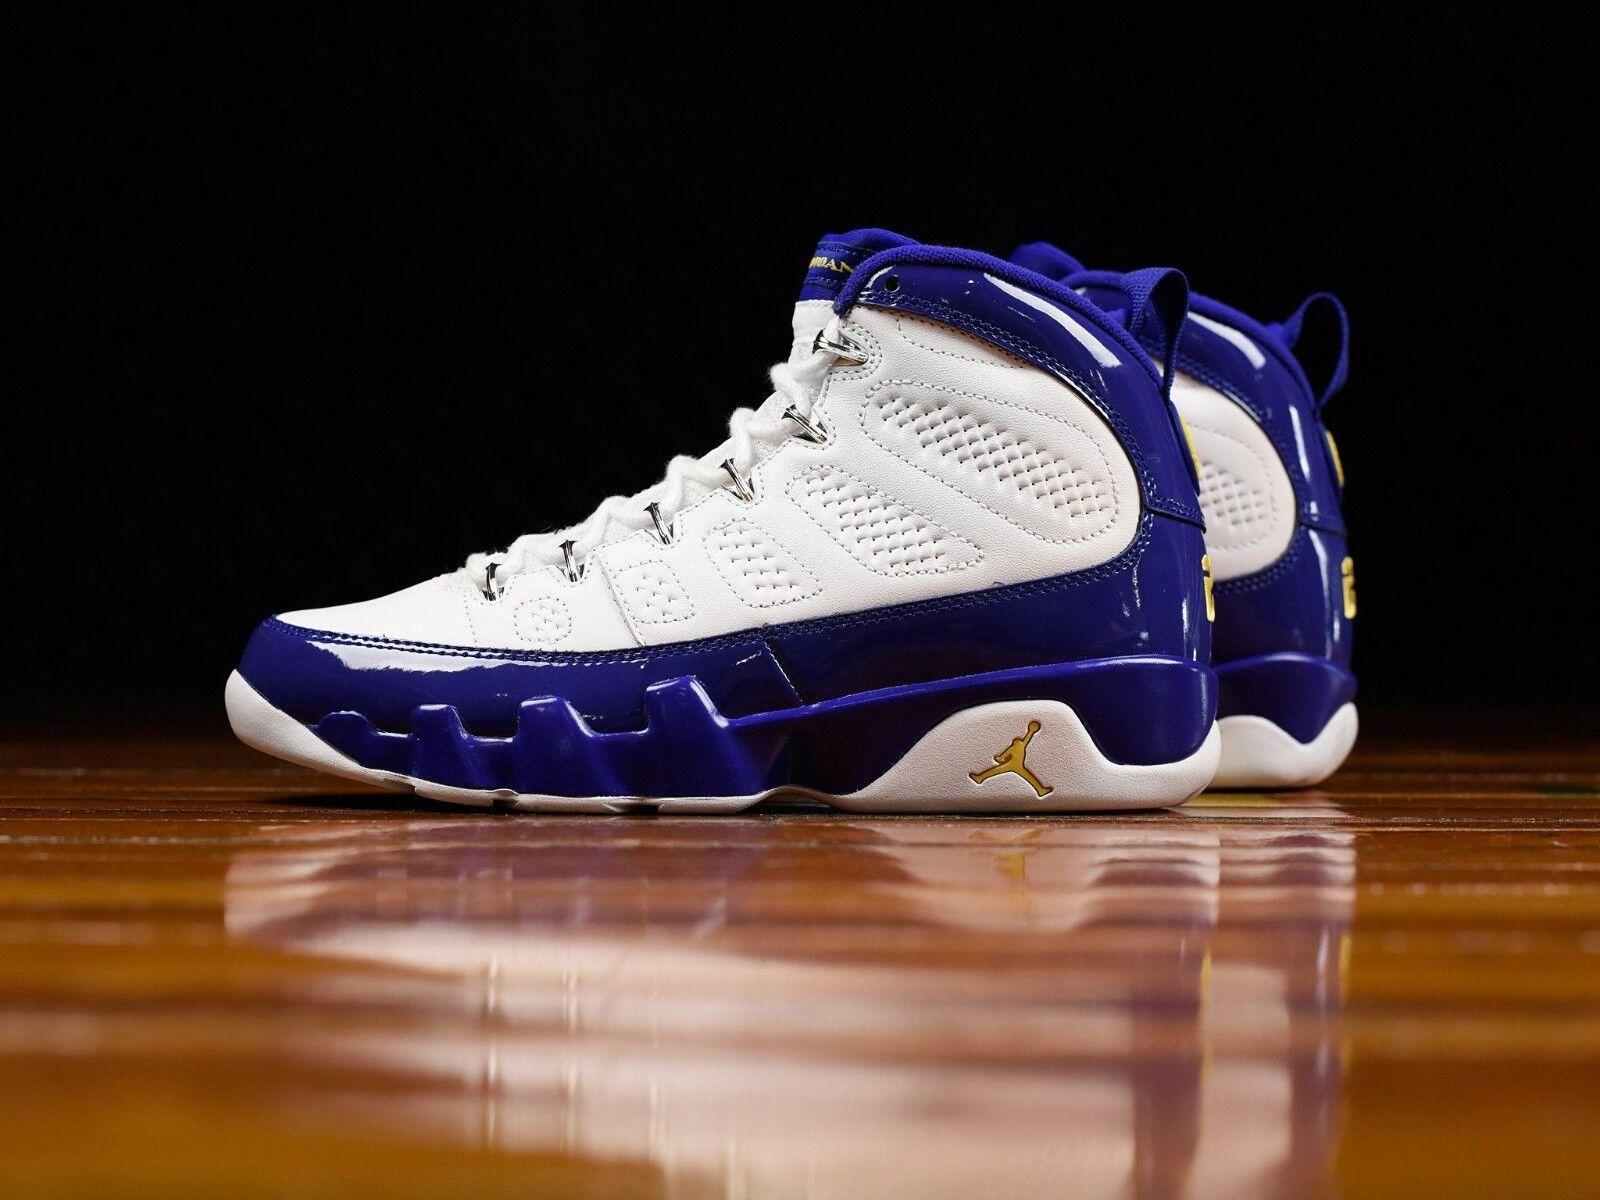 Nike Air Jordan 9 Retro 302370-121 SIZE 11.5 USA KOBE BRYANT 23 LAKERS TOUR NEW